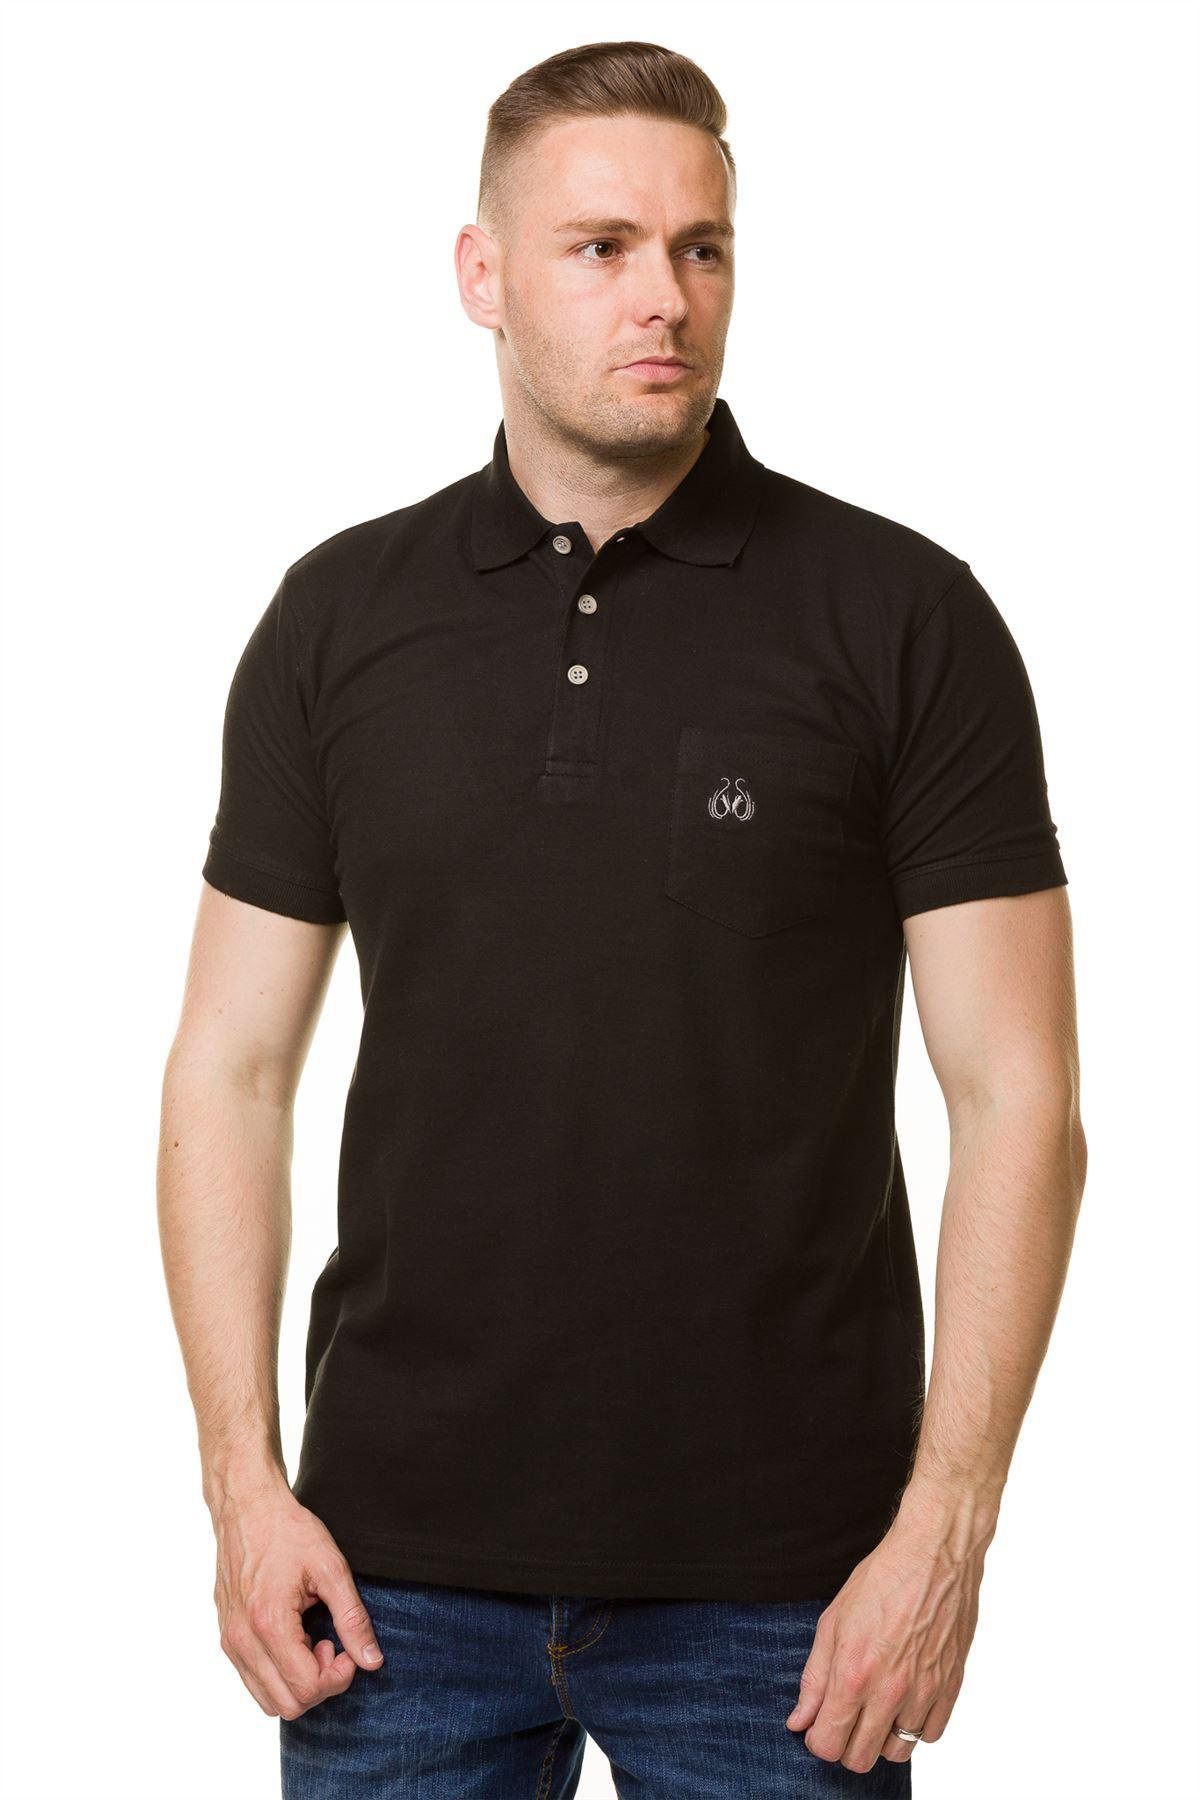 men�s tshirts cotton regular fit branded plain polo